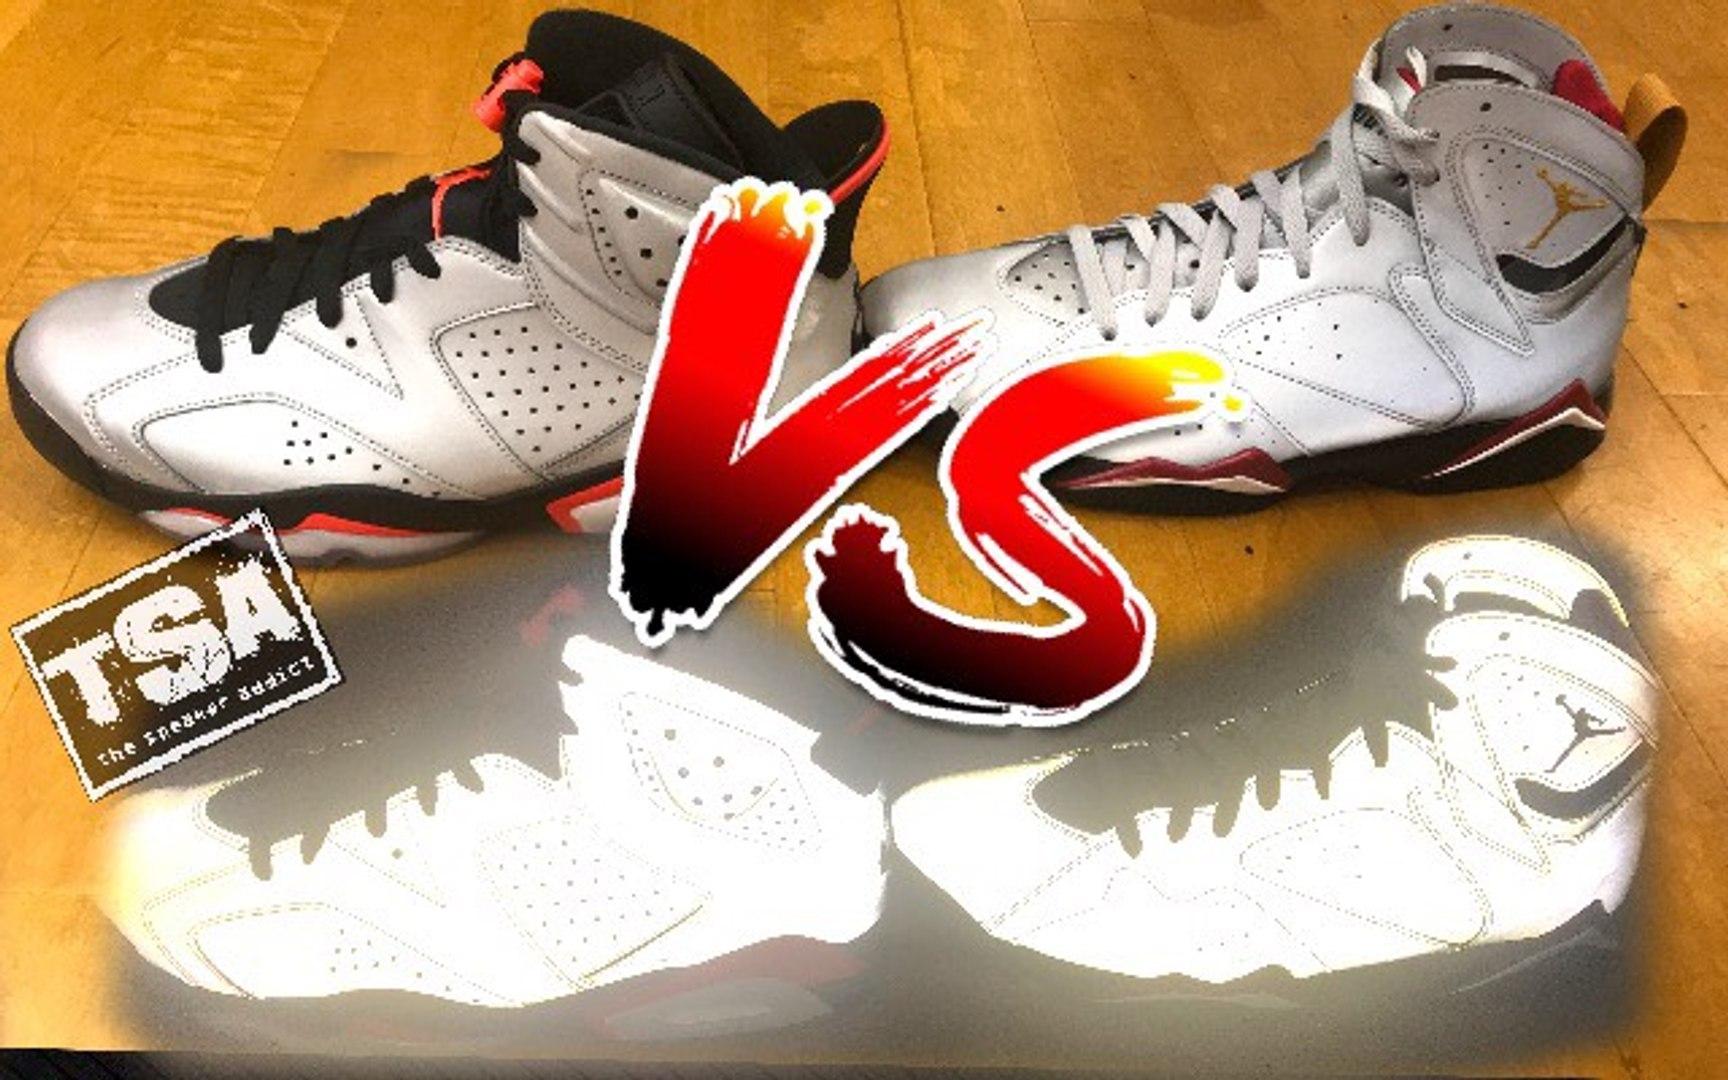 Air Jordan 6 VS 7 3m Retro Reflection Of A Champion Sneaker Battle PickOne